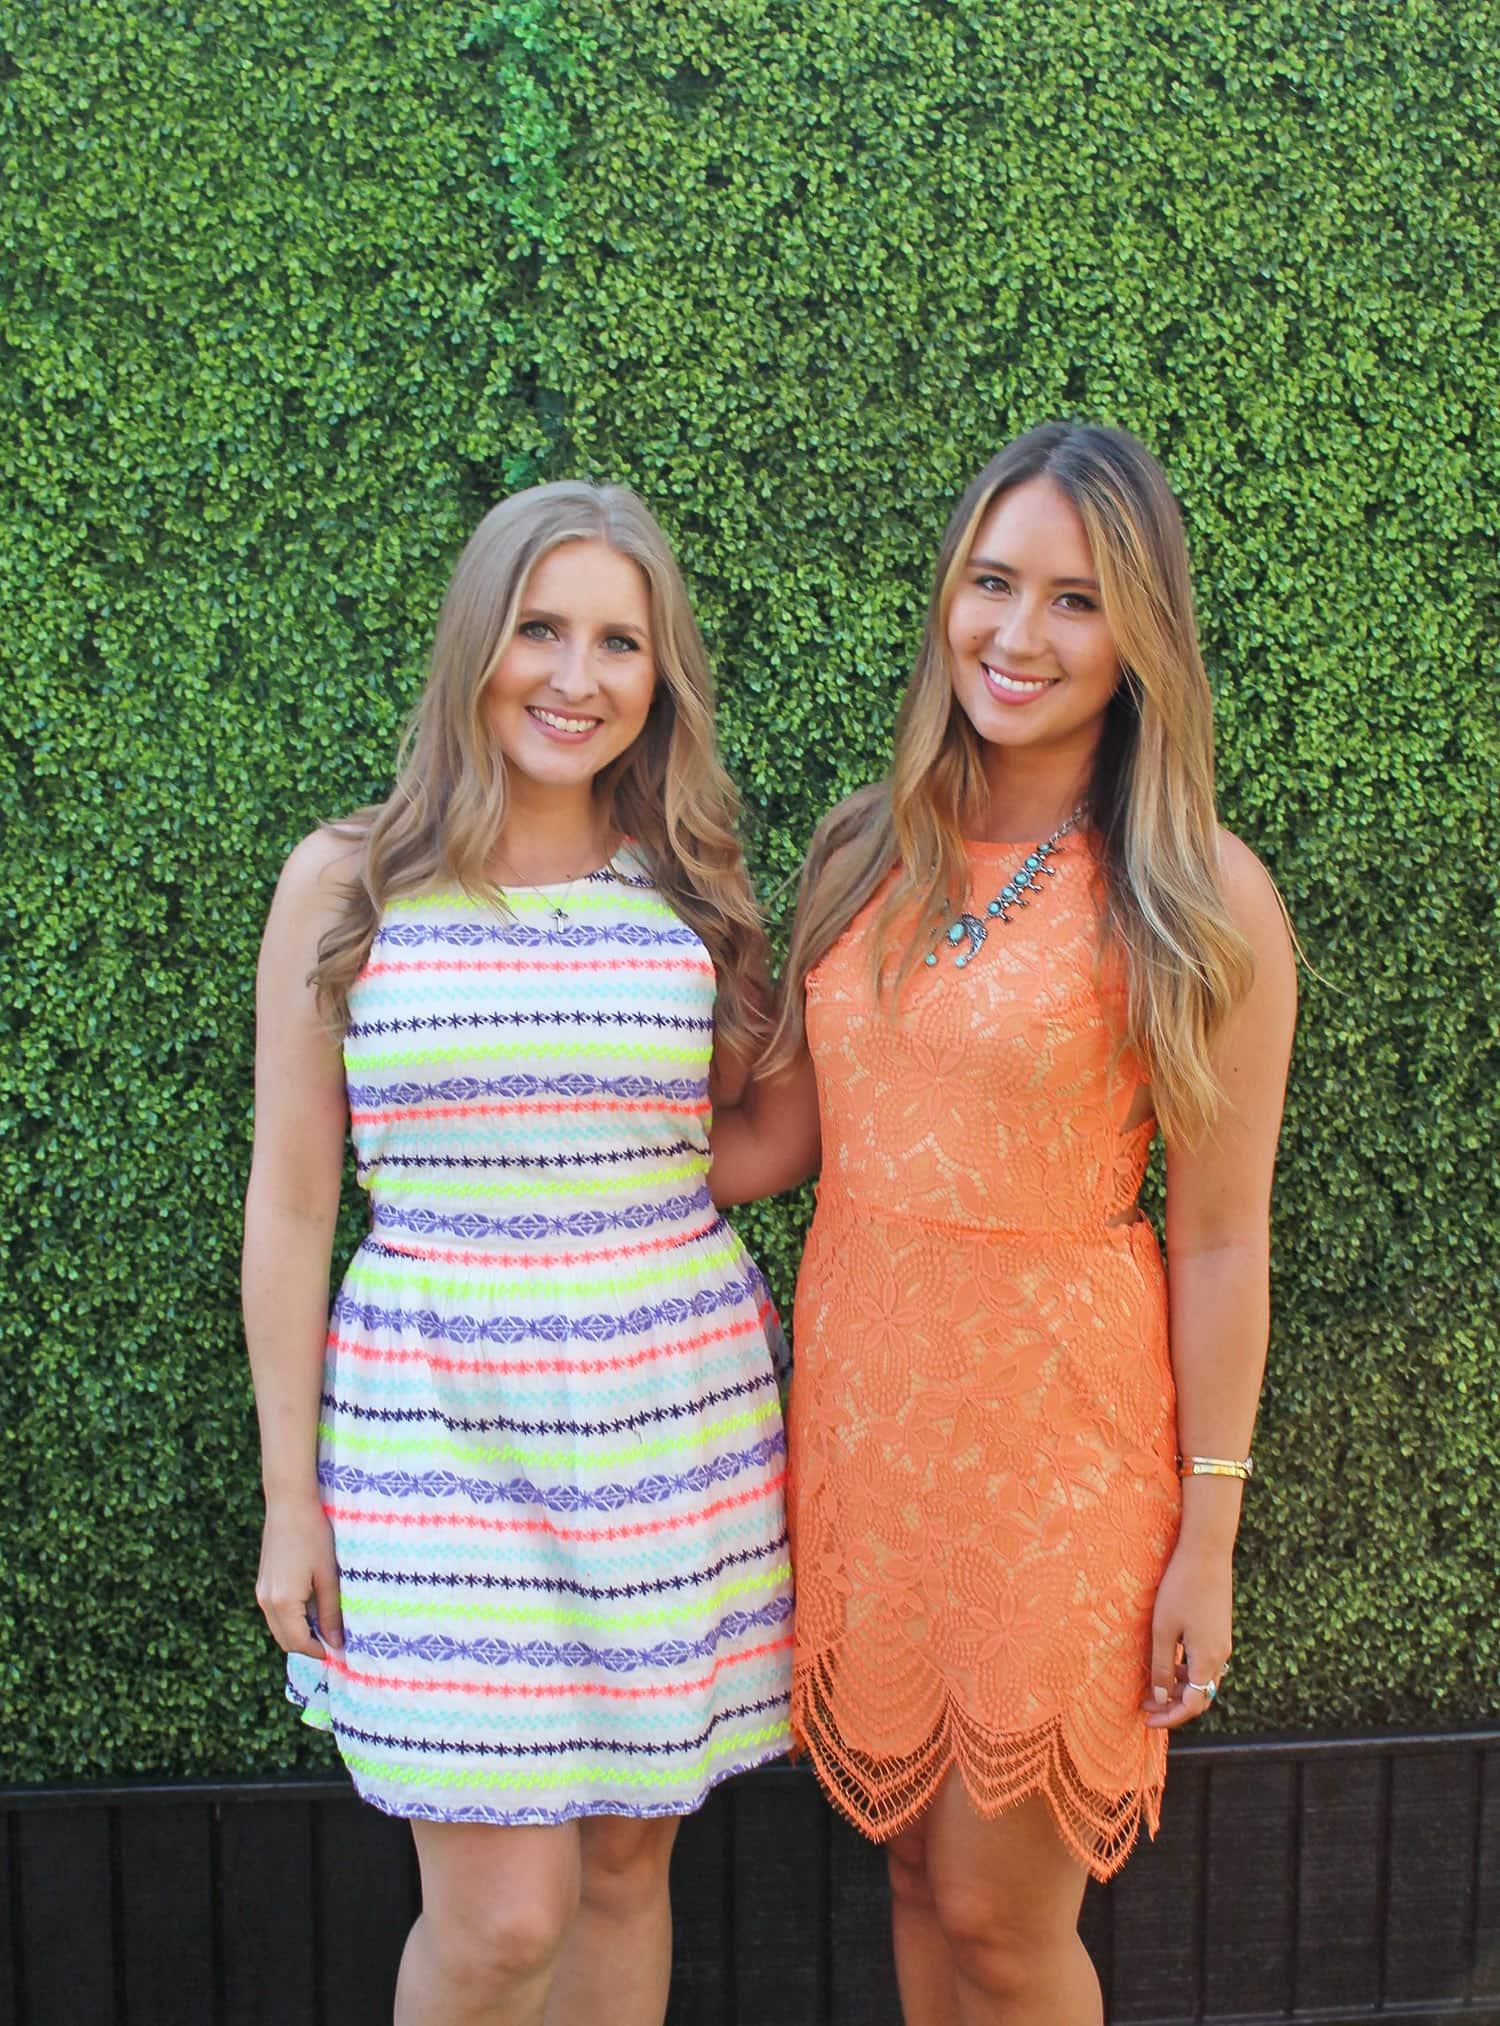 Style bloggers Ashley Brooke Nicholas and Boho Nouveau | Create + Cultivate Los Angeles 2016 Conference Recap + Review | Beauty and Style Blogger Ashley Brooke Nicholas